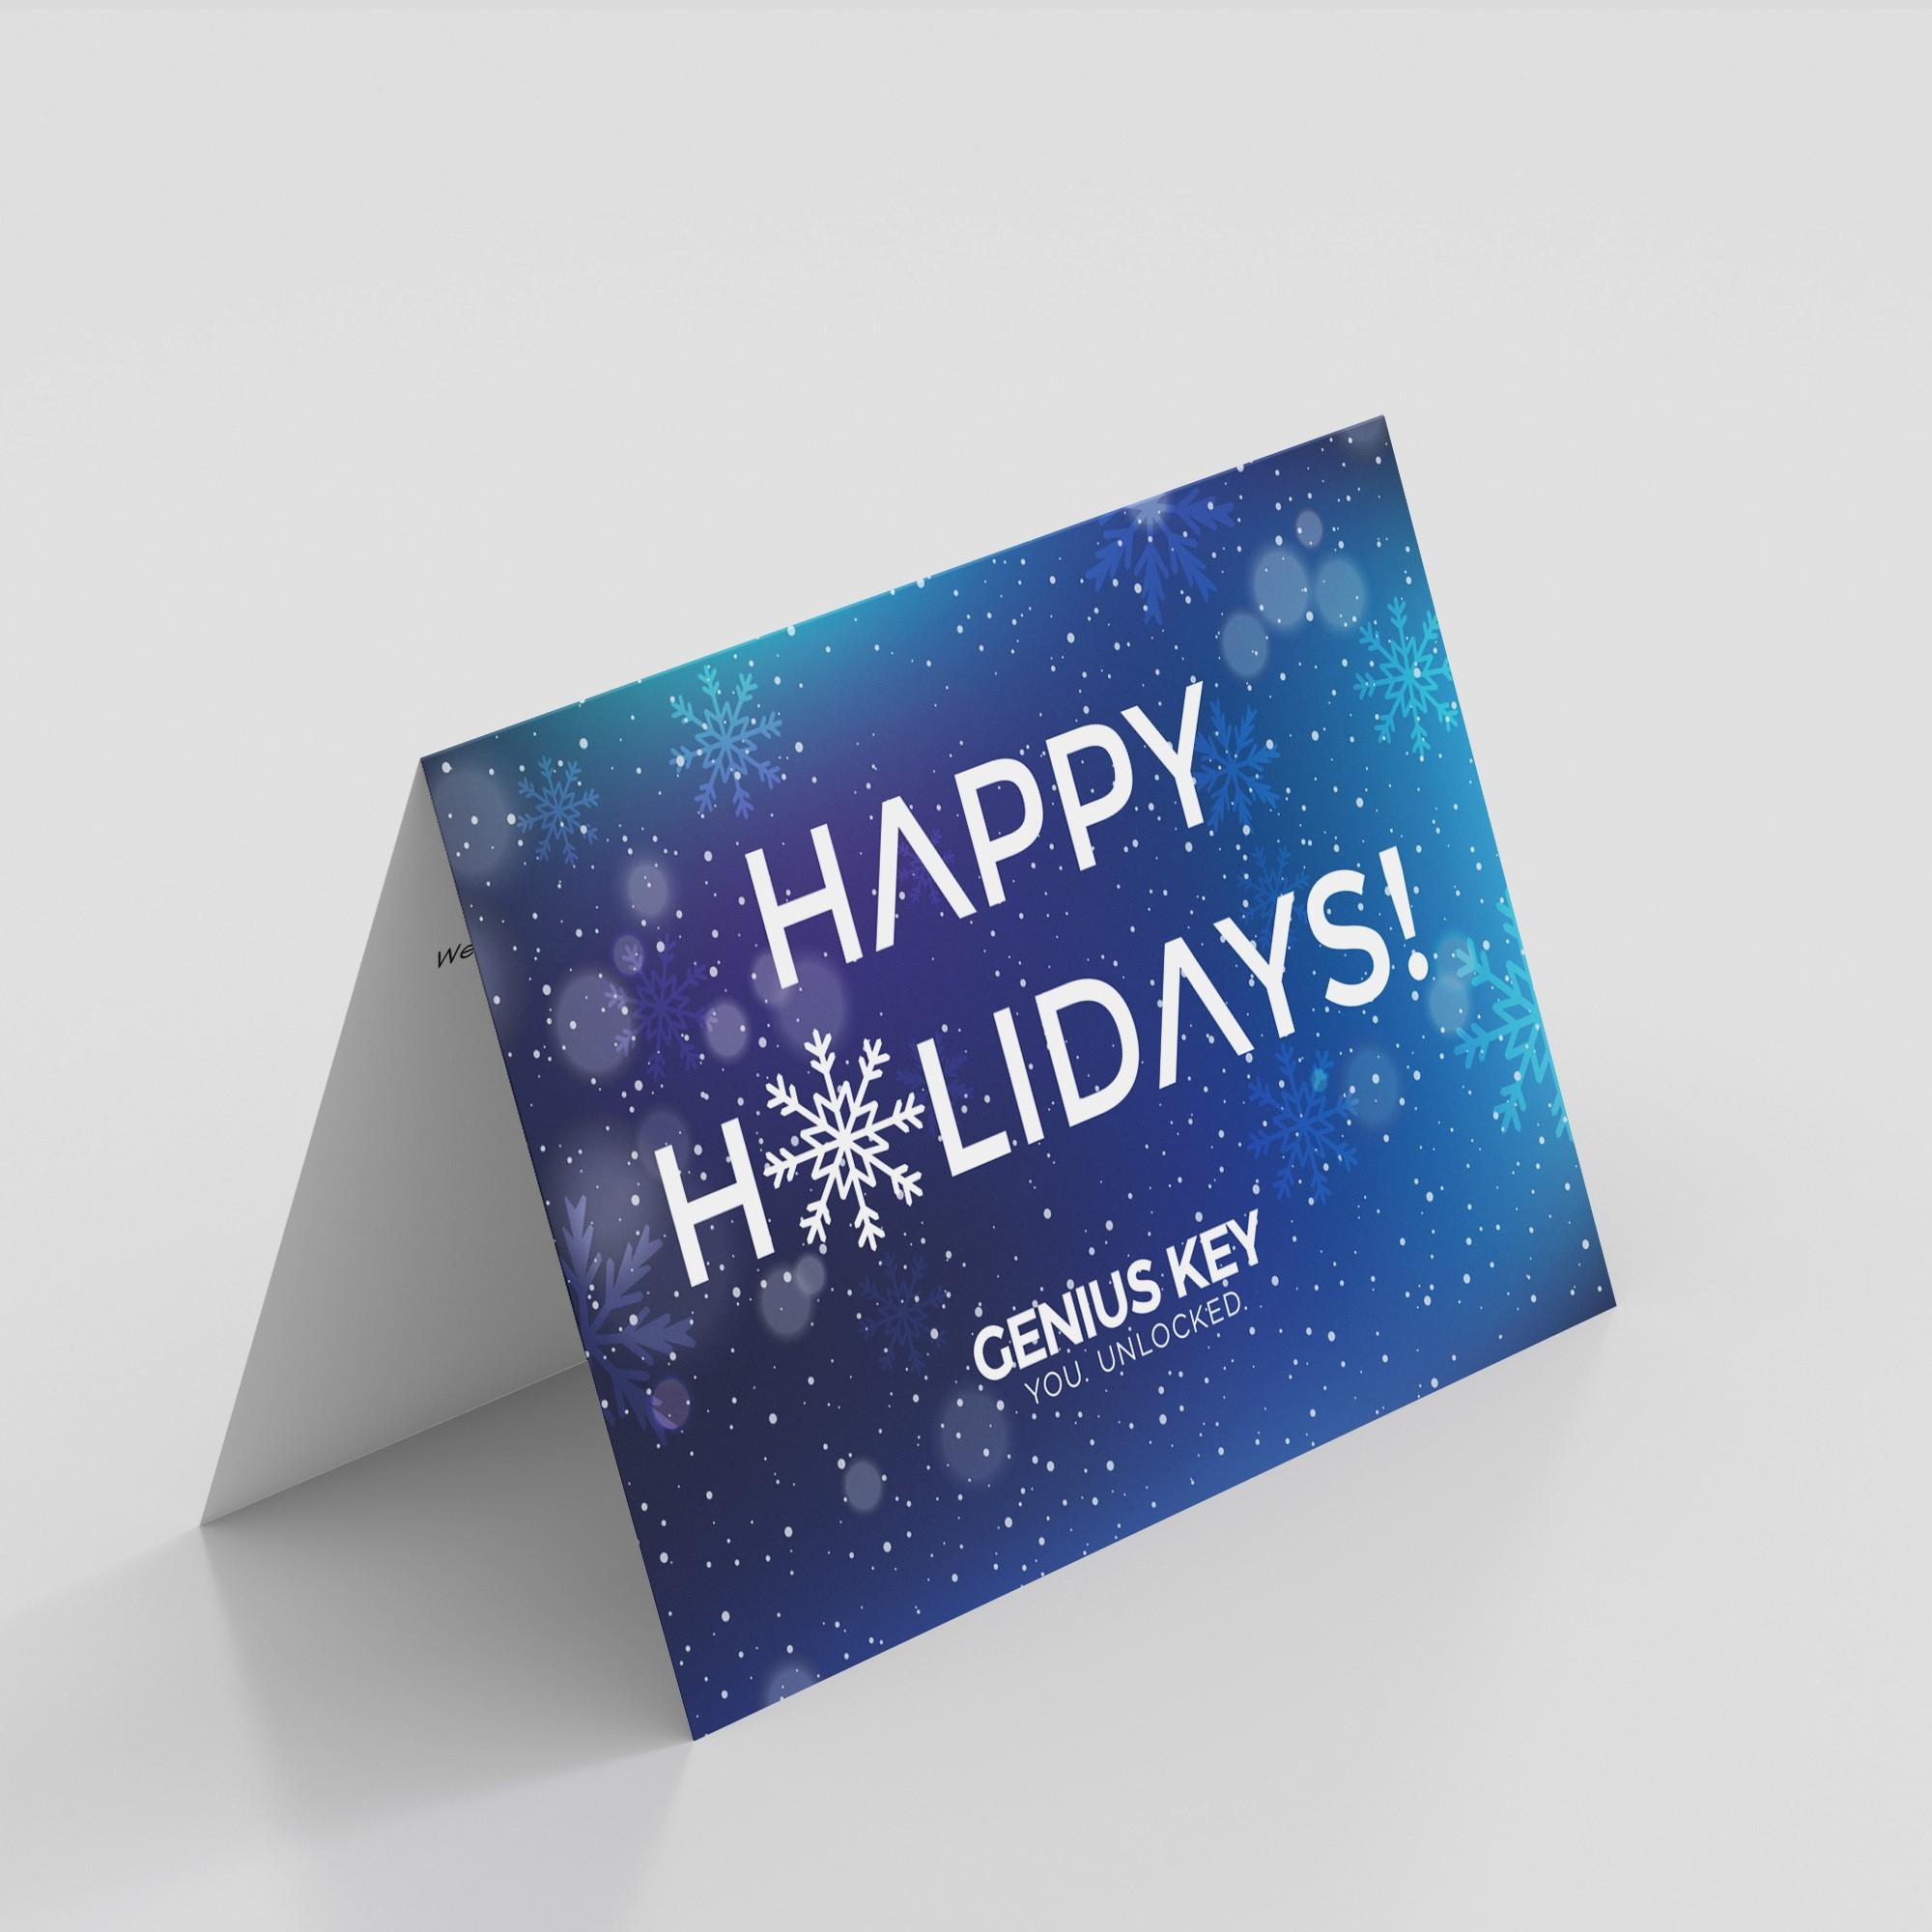 Genius Key Holiday Cards